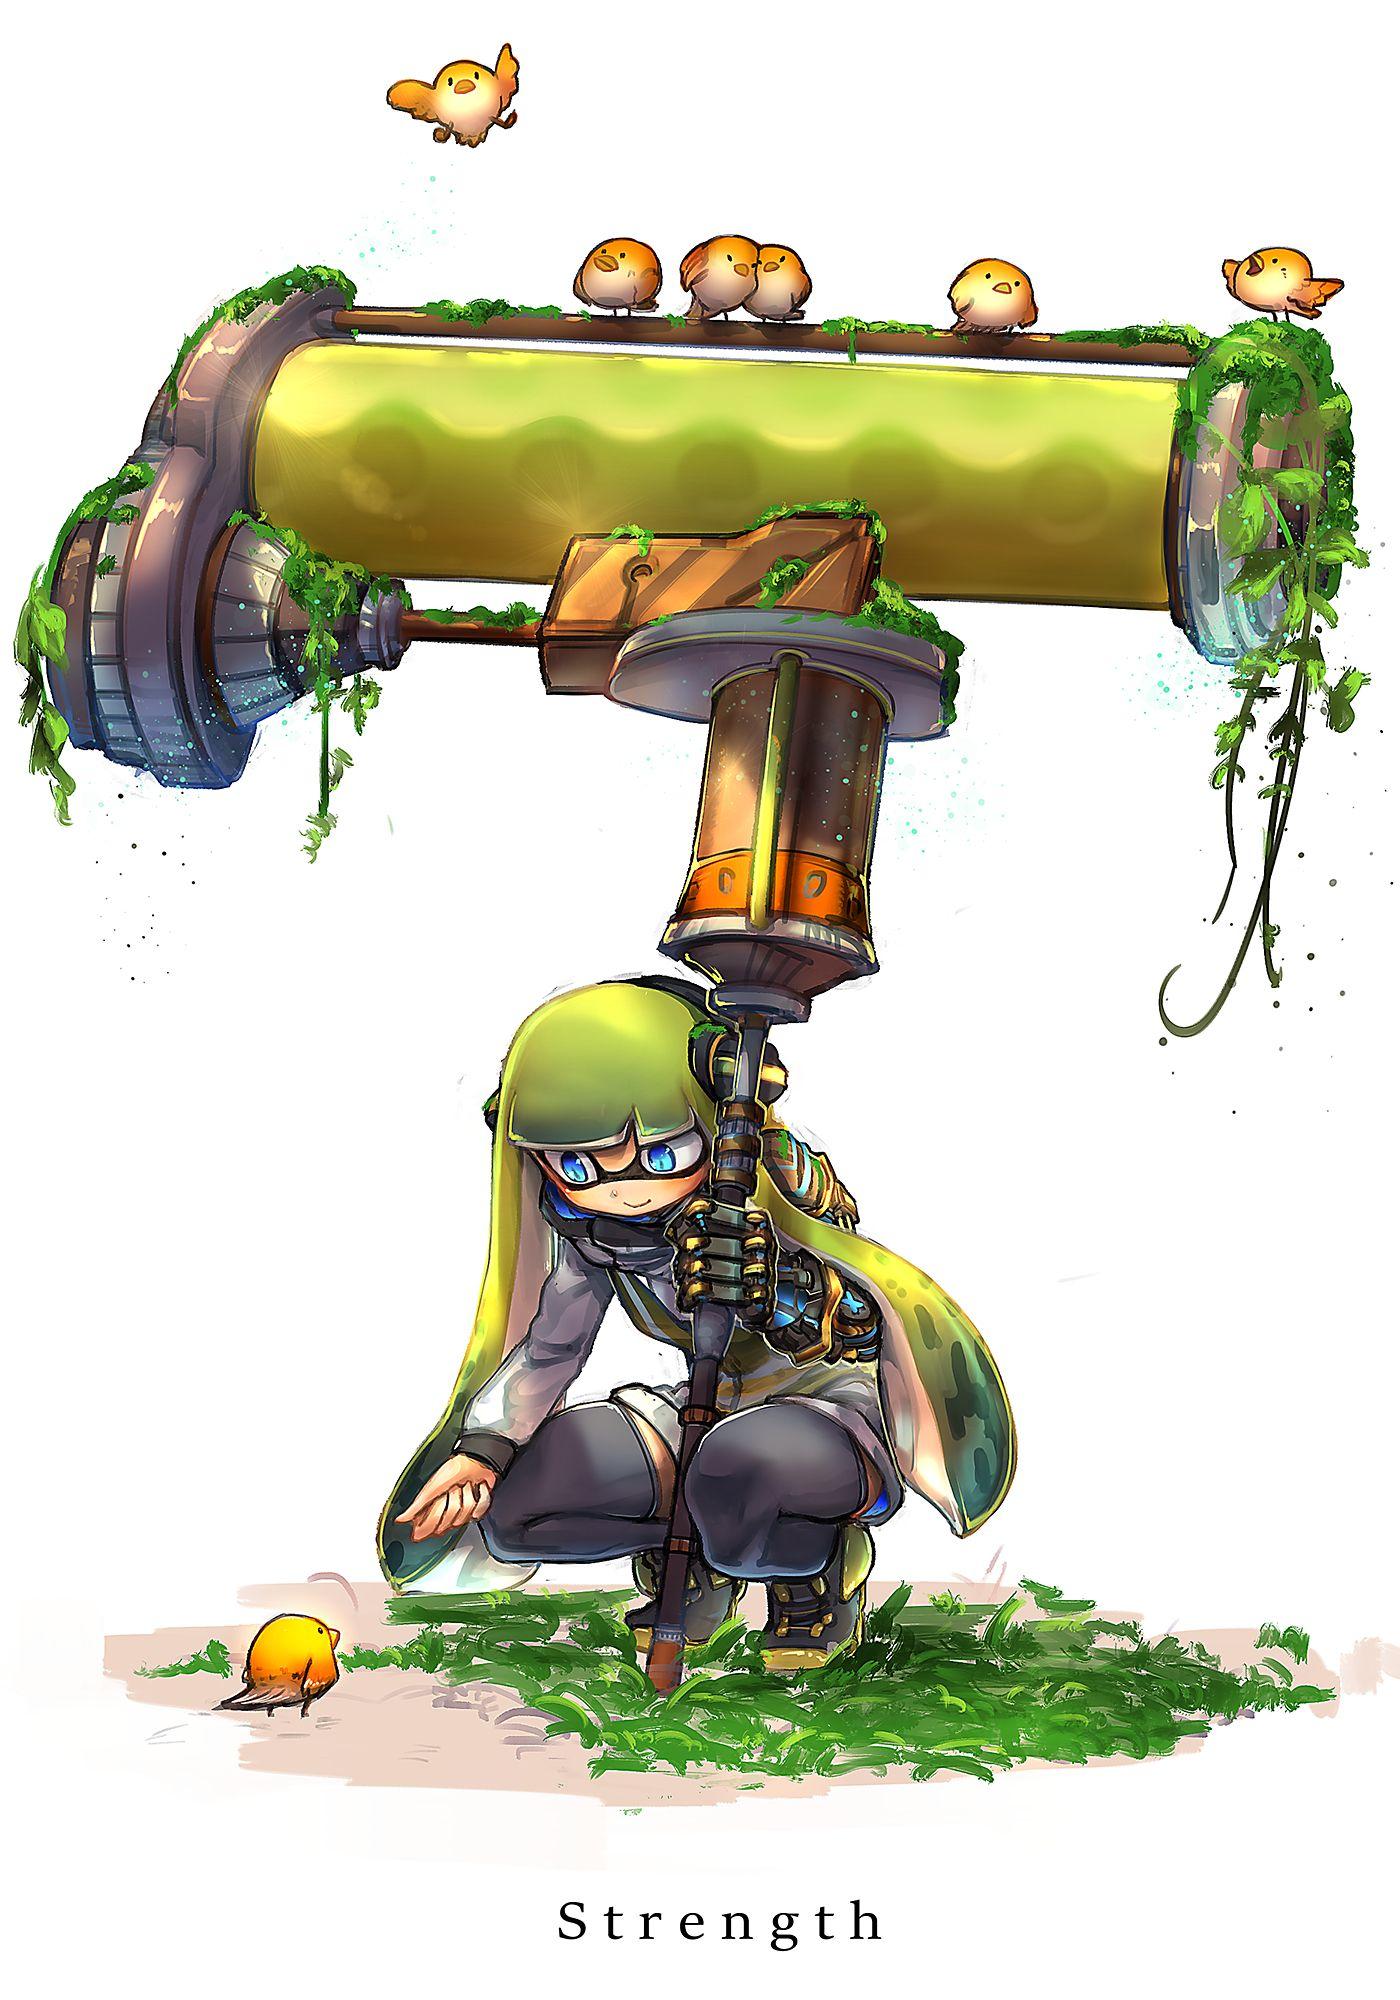 Inkling Splatoon Image 2053474 Zerochan Anime Image Board